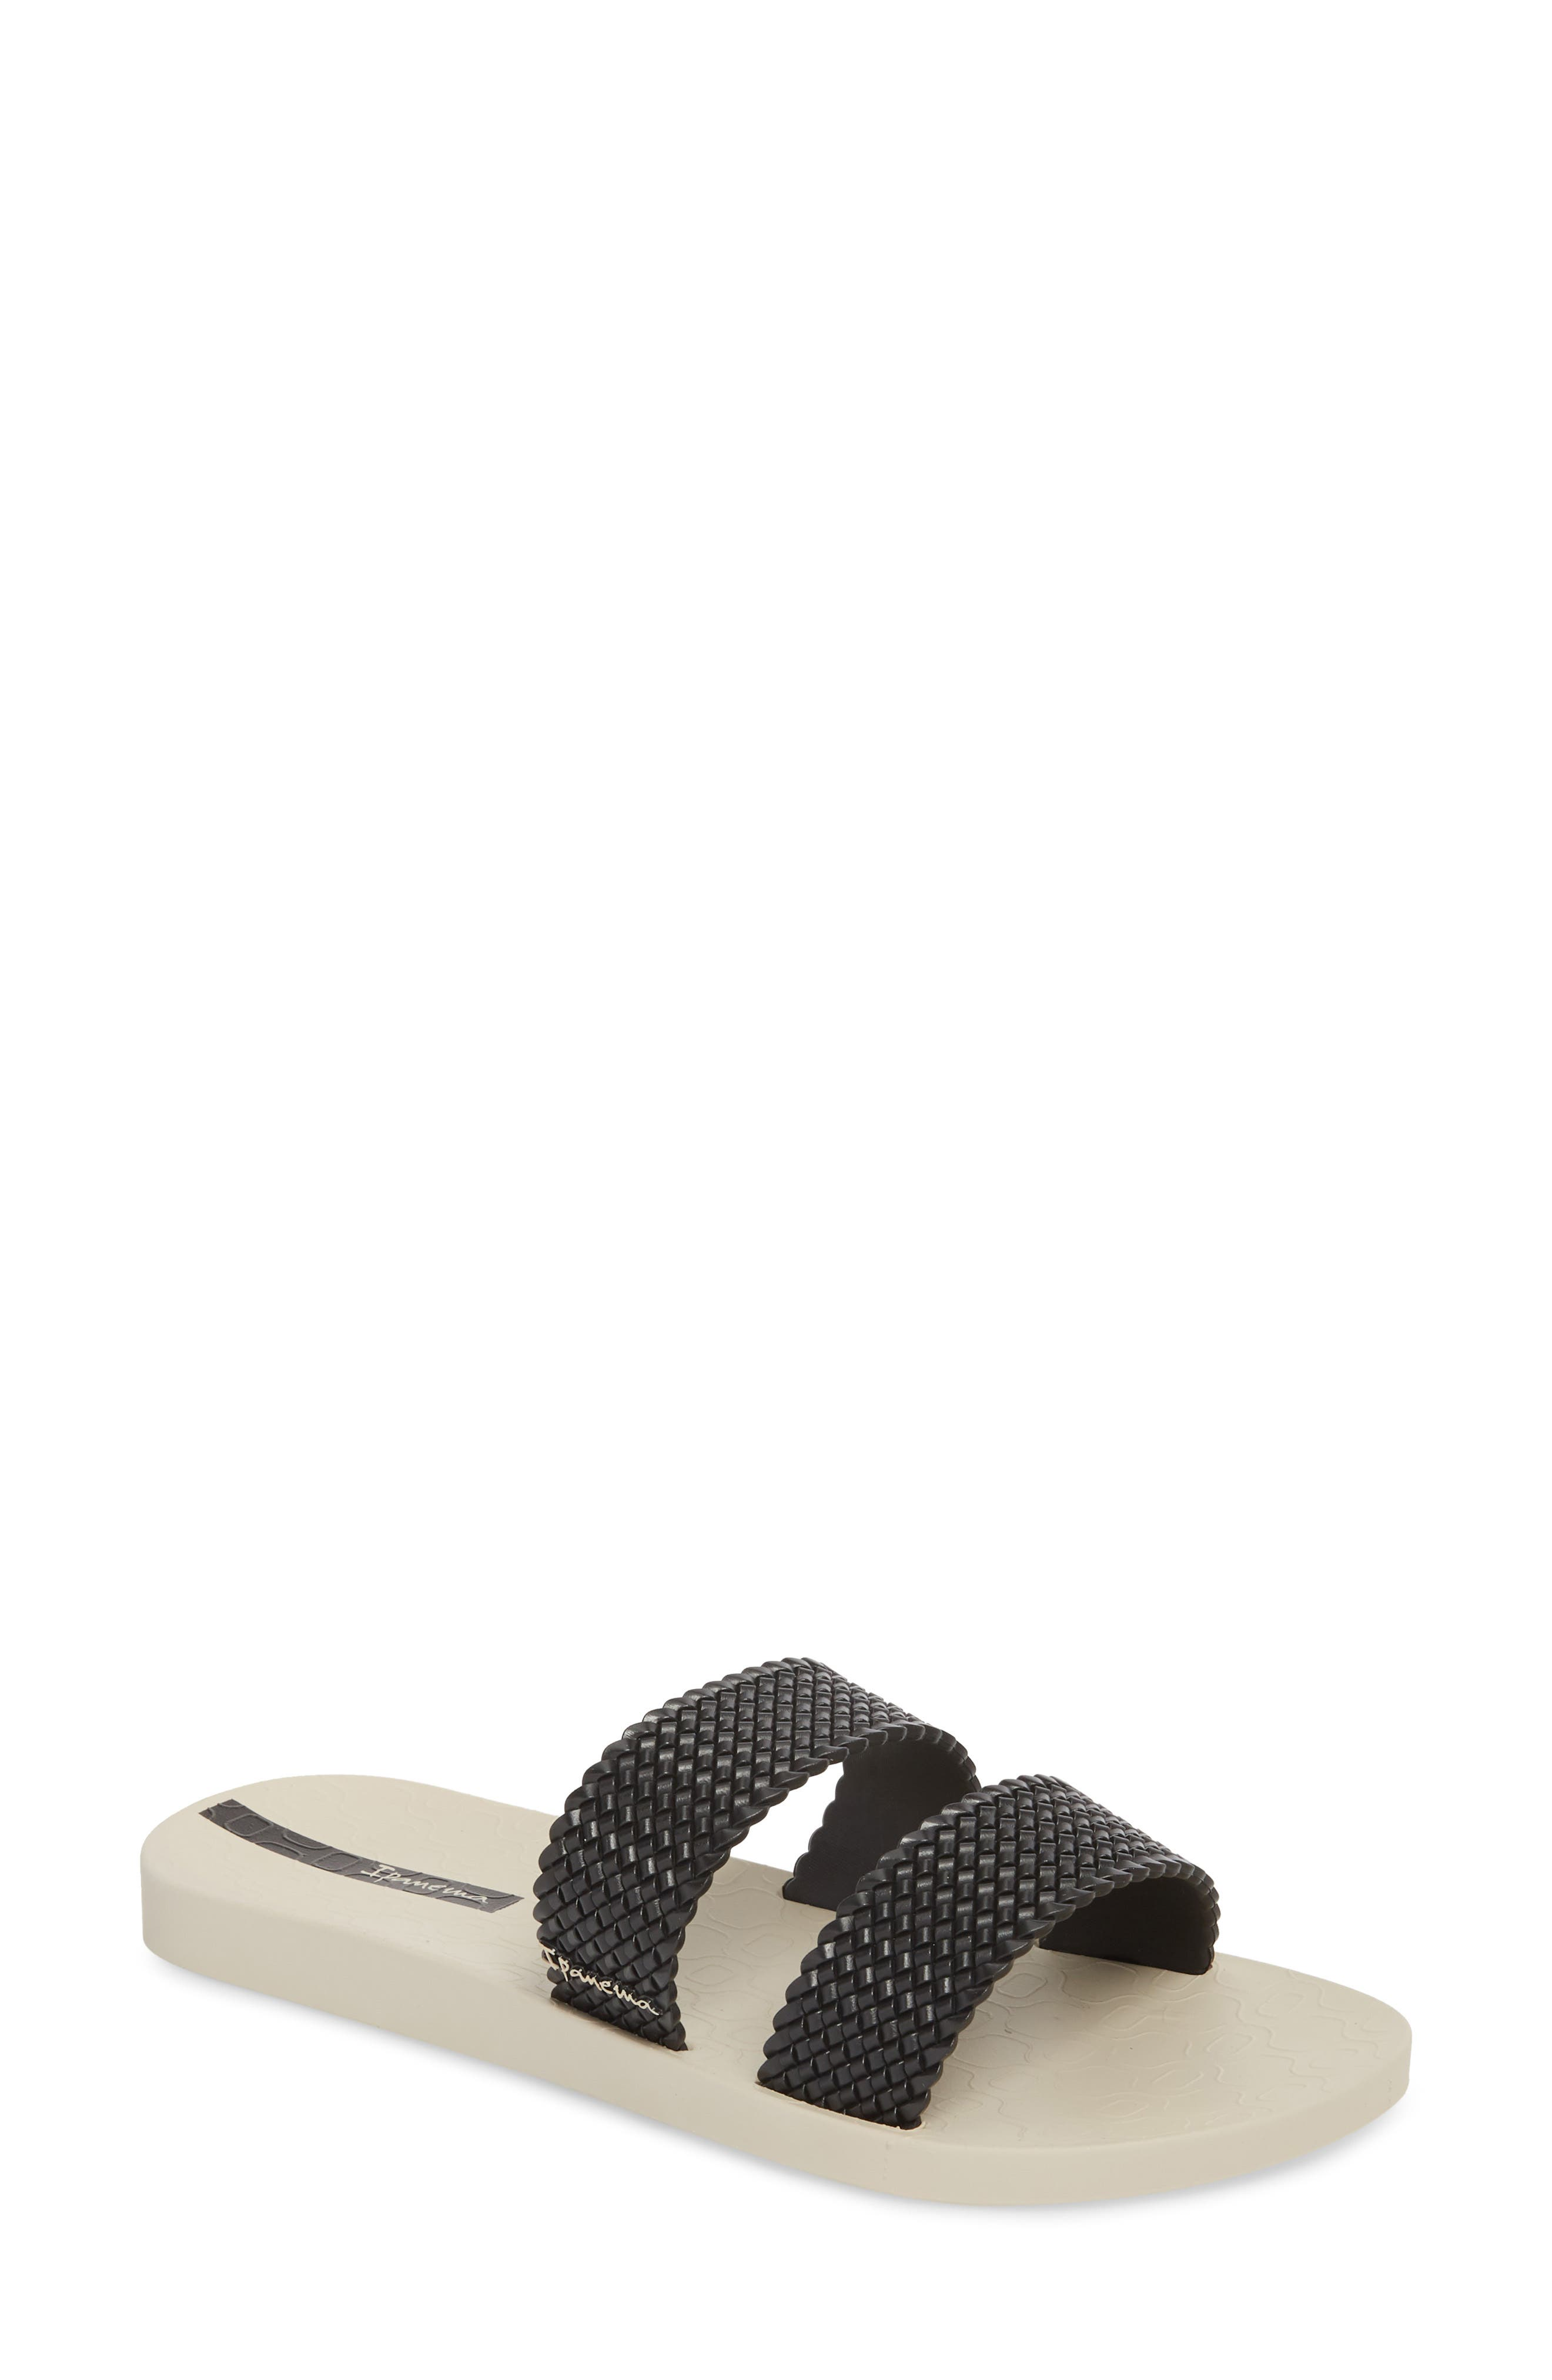 IPANEMA City Slide Sandal in Beige/ Black